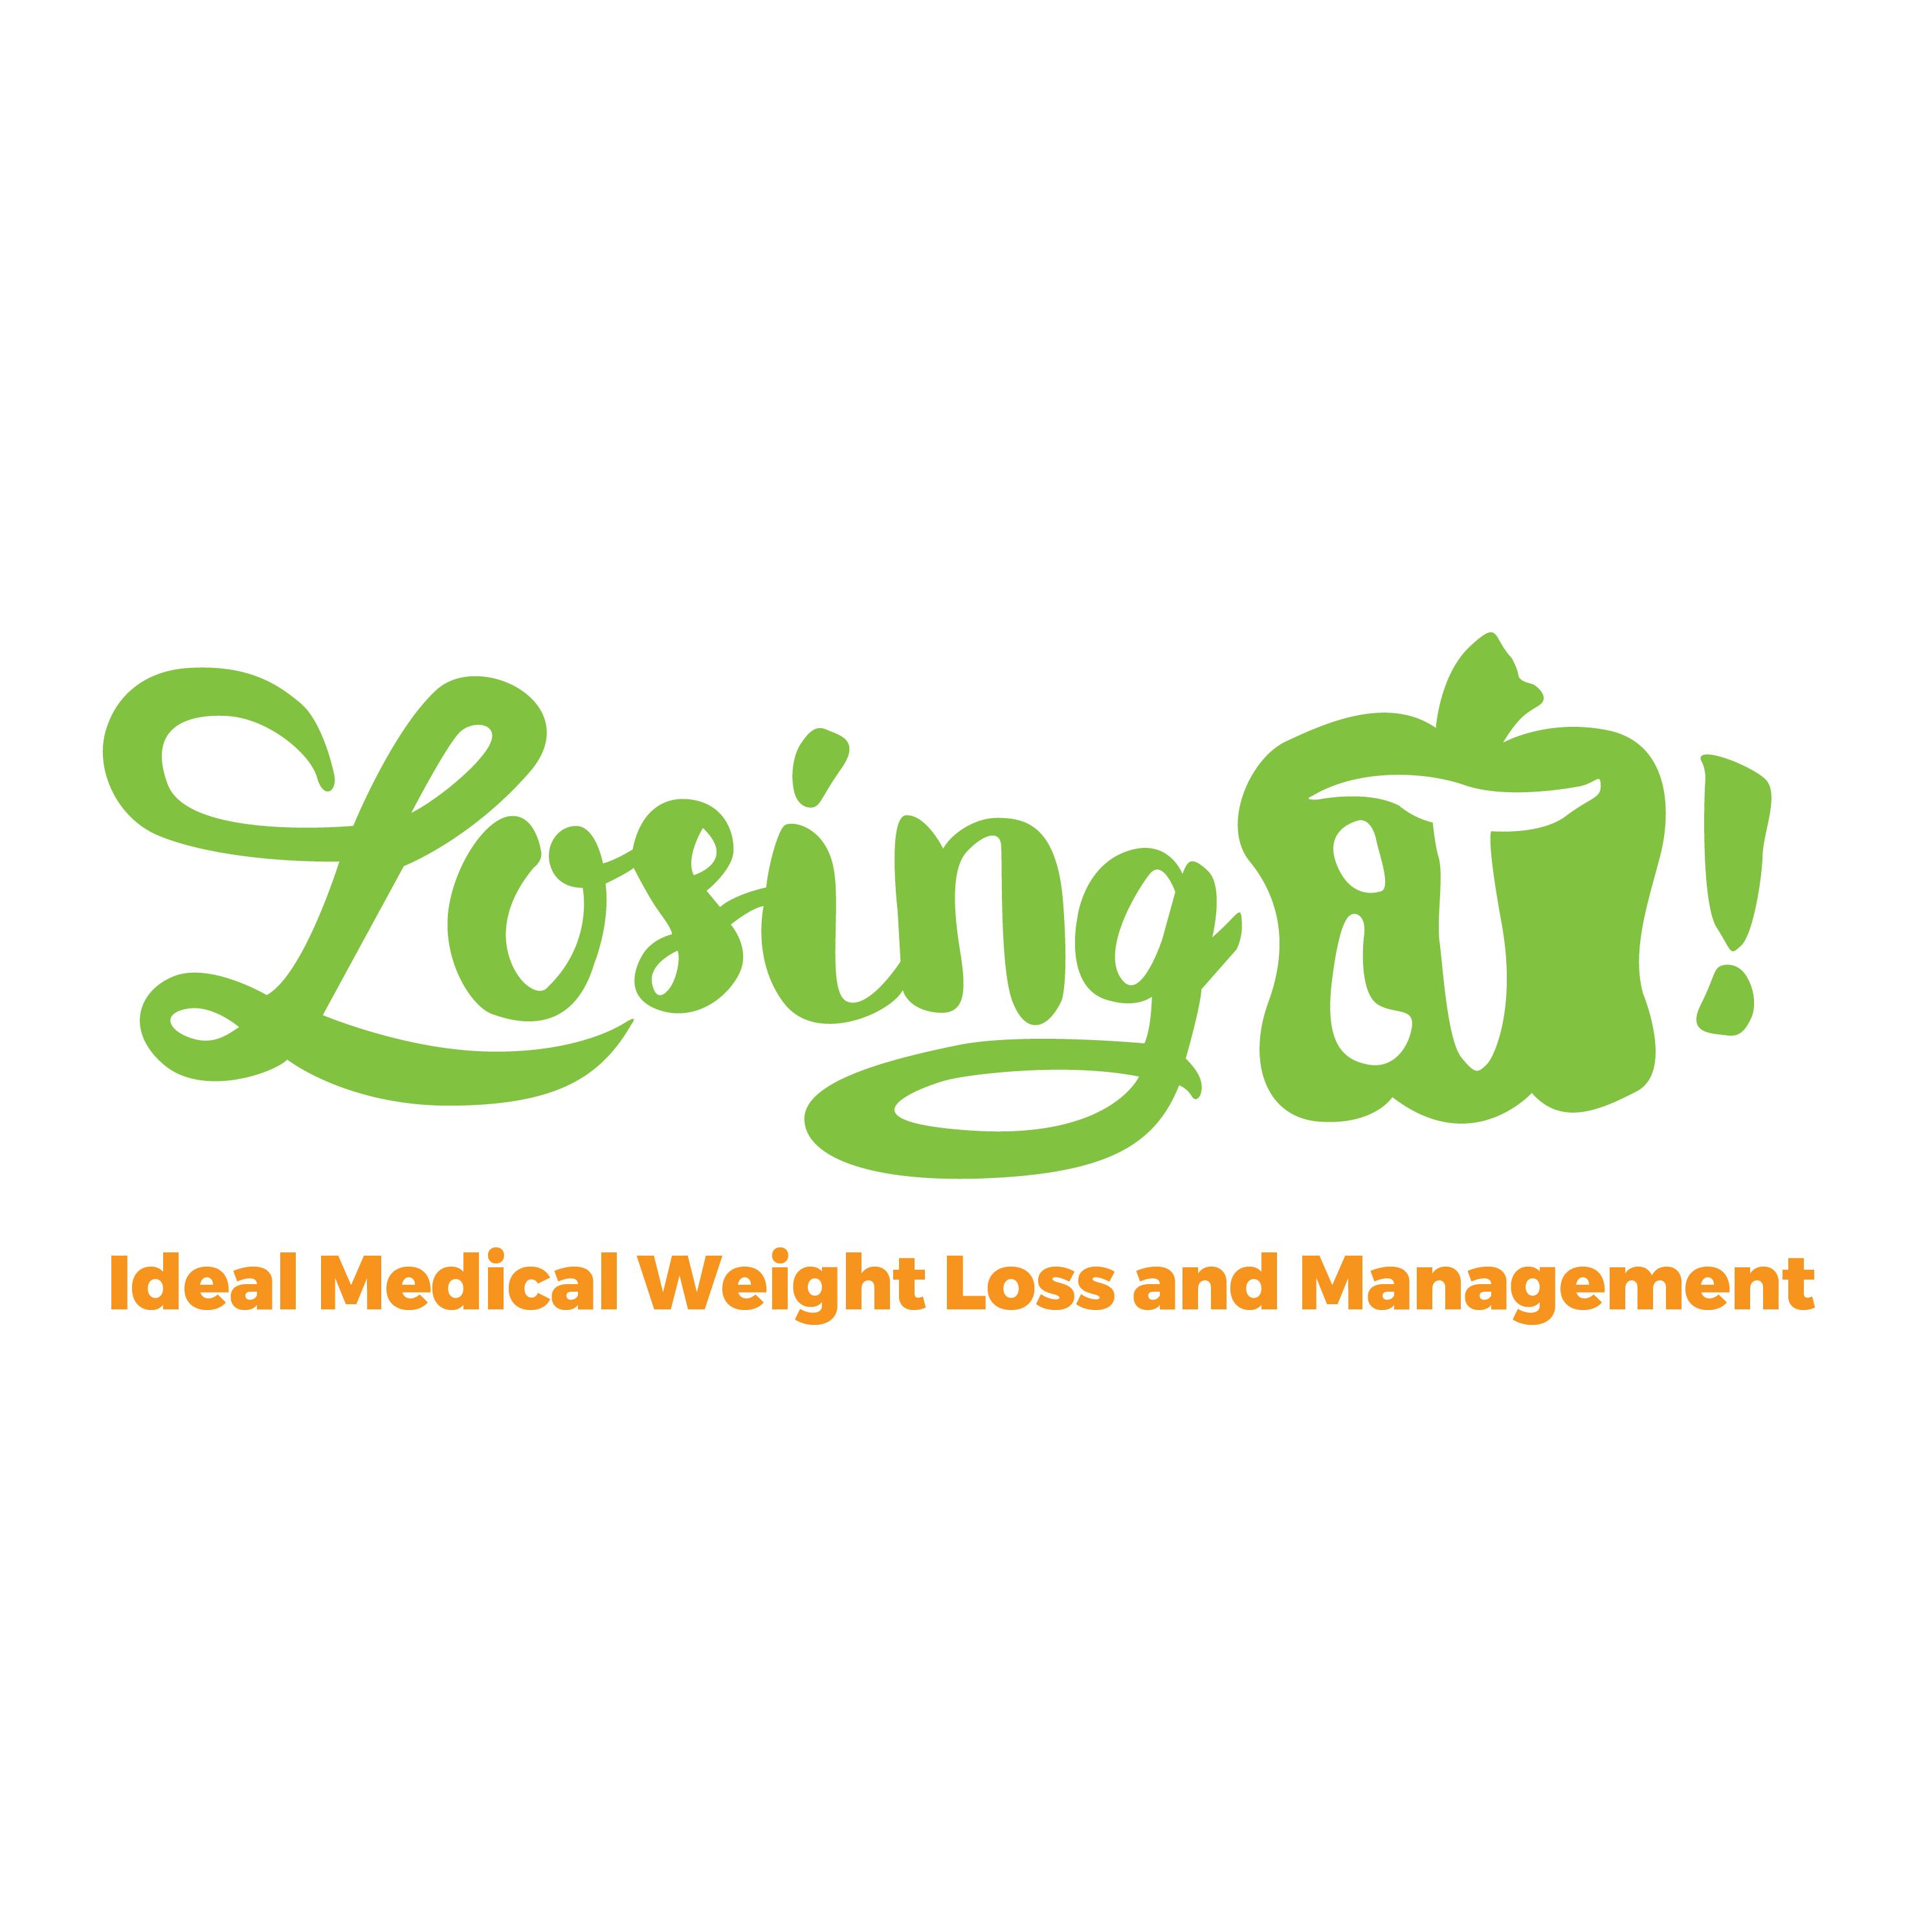 Losing iT! LLC